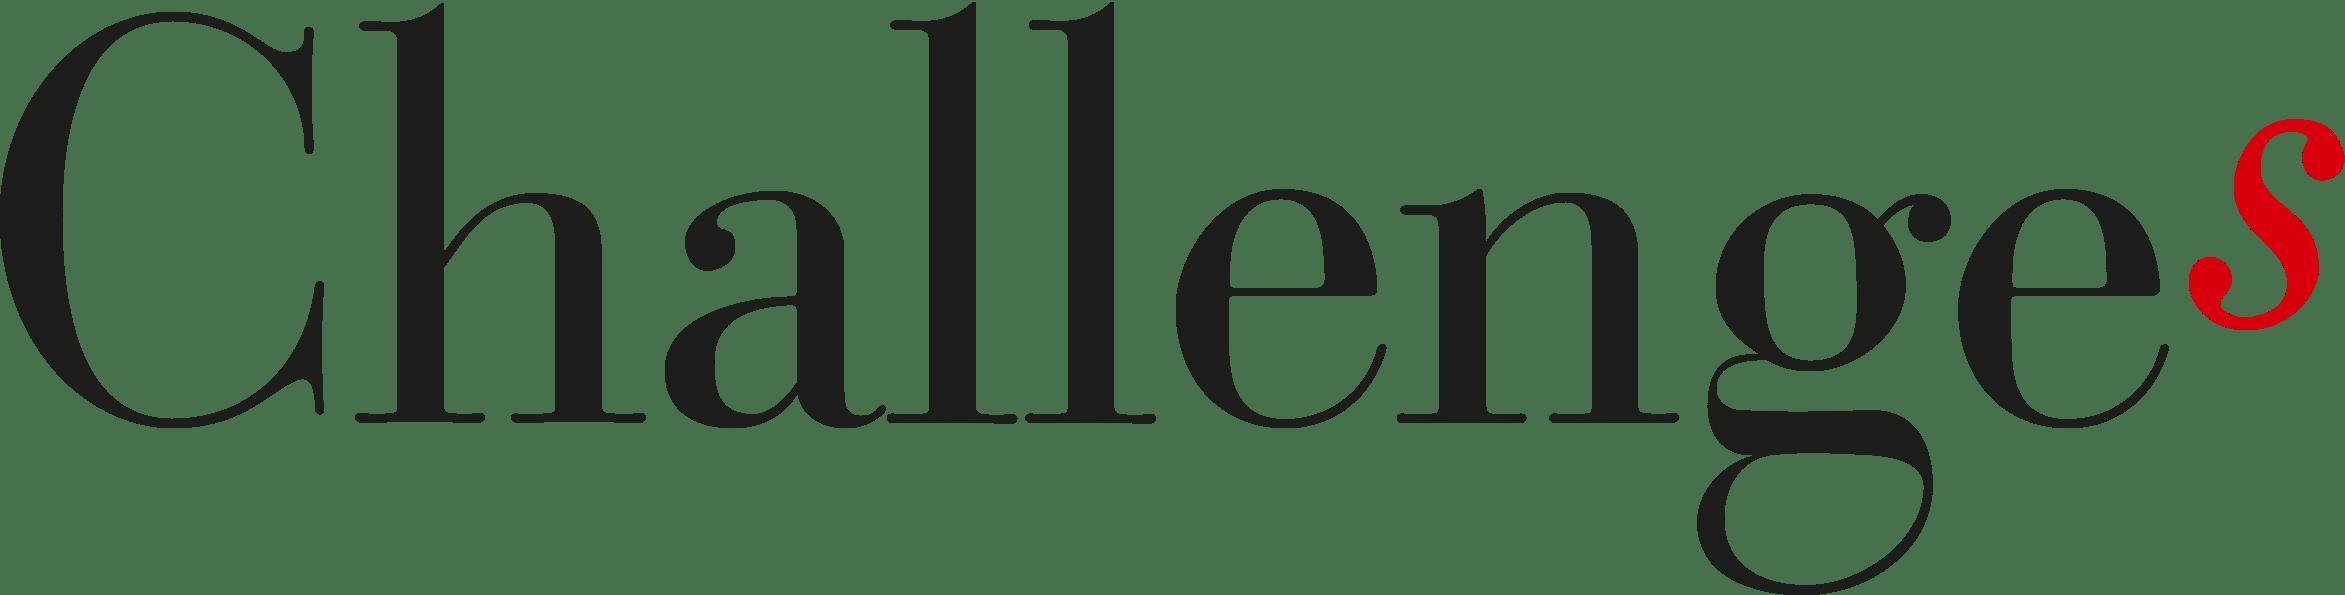 Challenges company logo